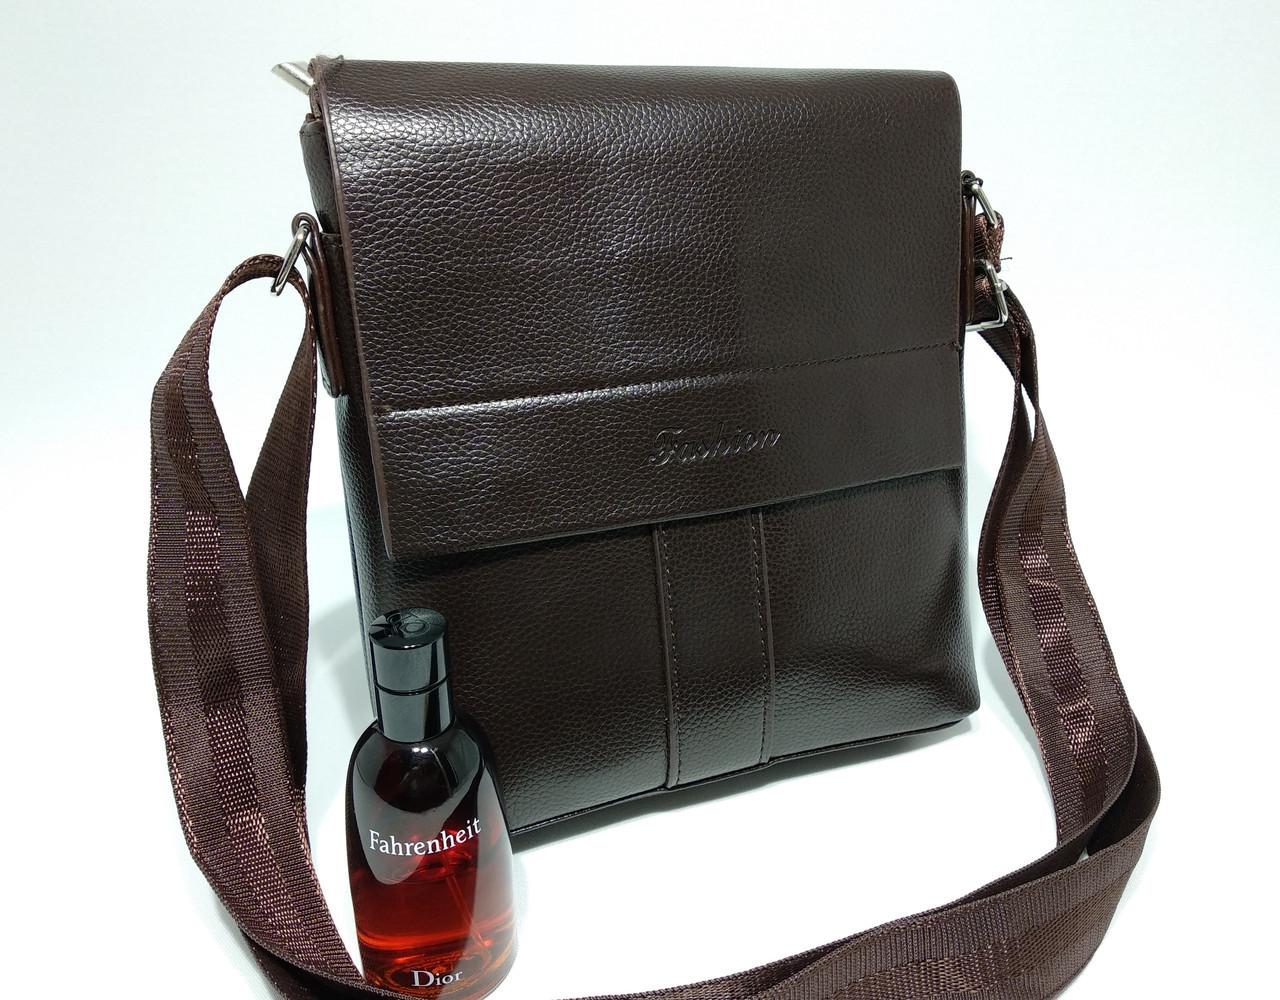 0a1200bb3234 Мужская сумка кожа pu fashion темно коричневая 21*23*4: продажа ...